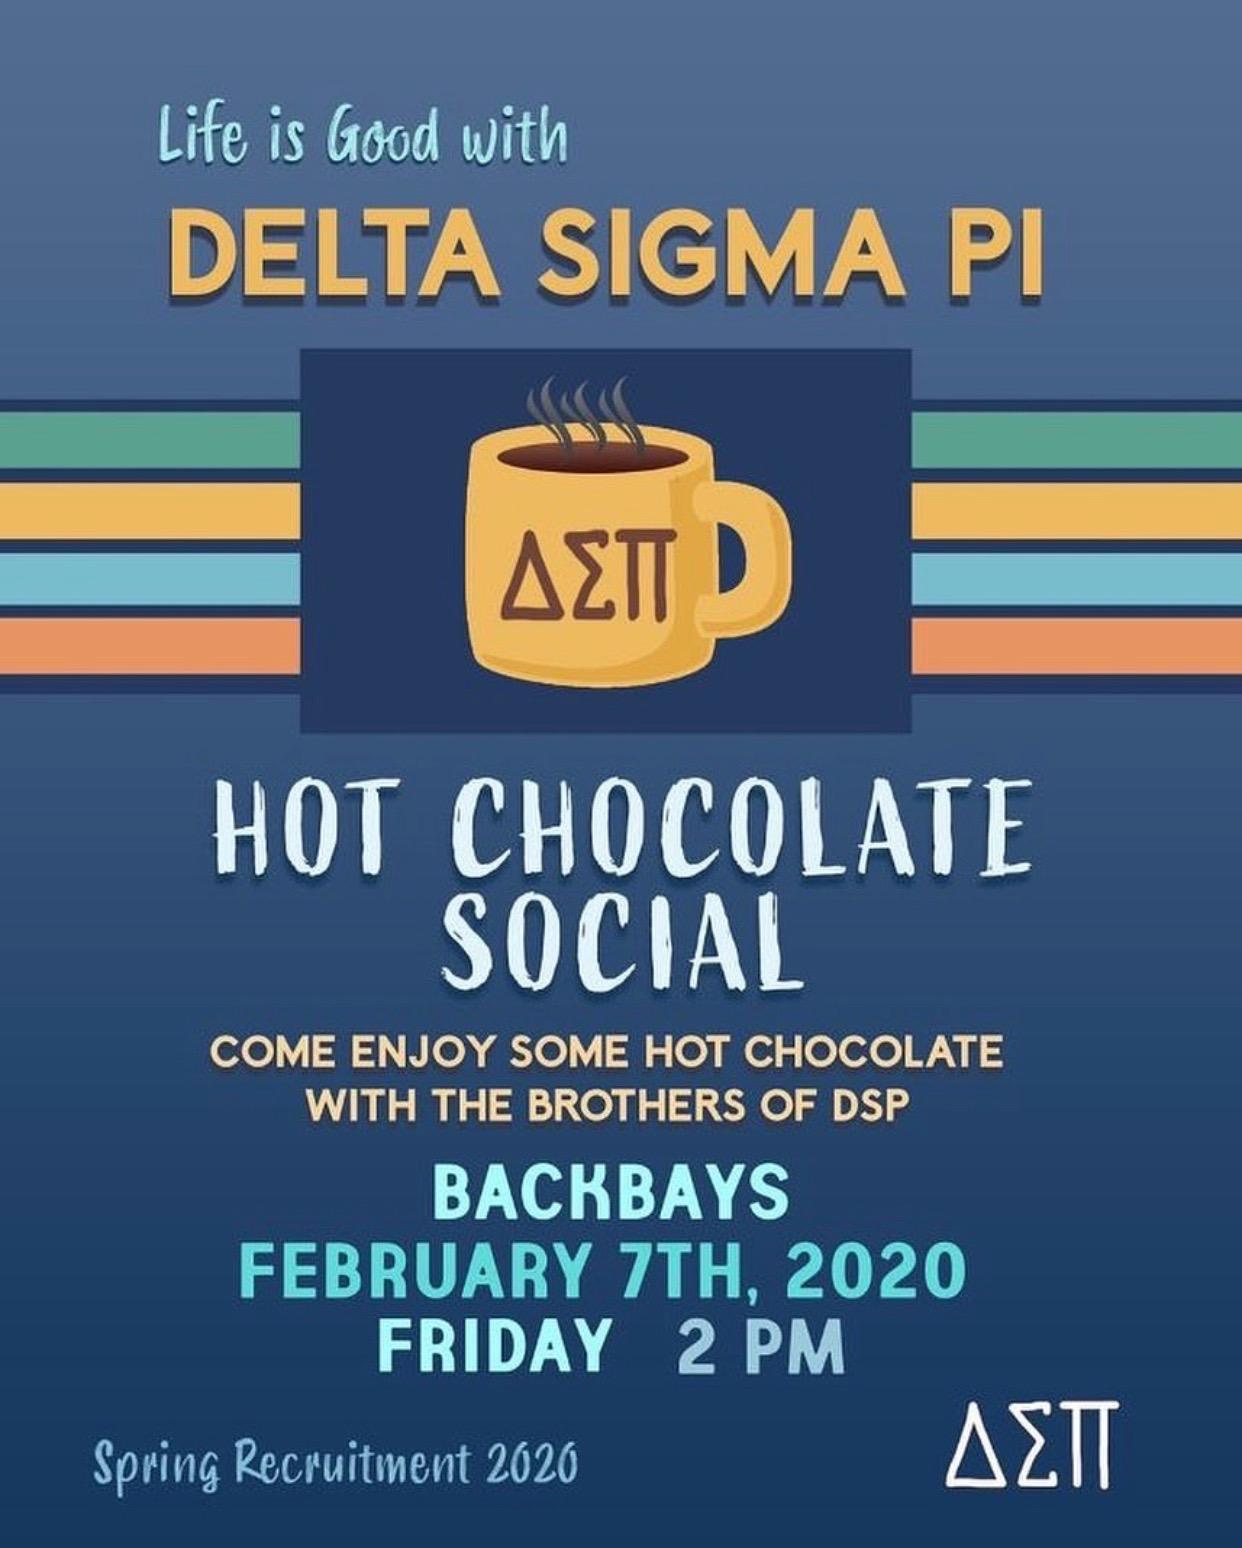 #7 Hot Chocolate Social